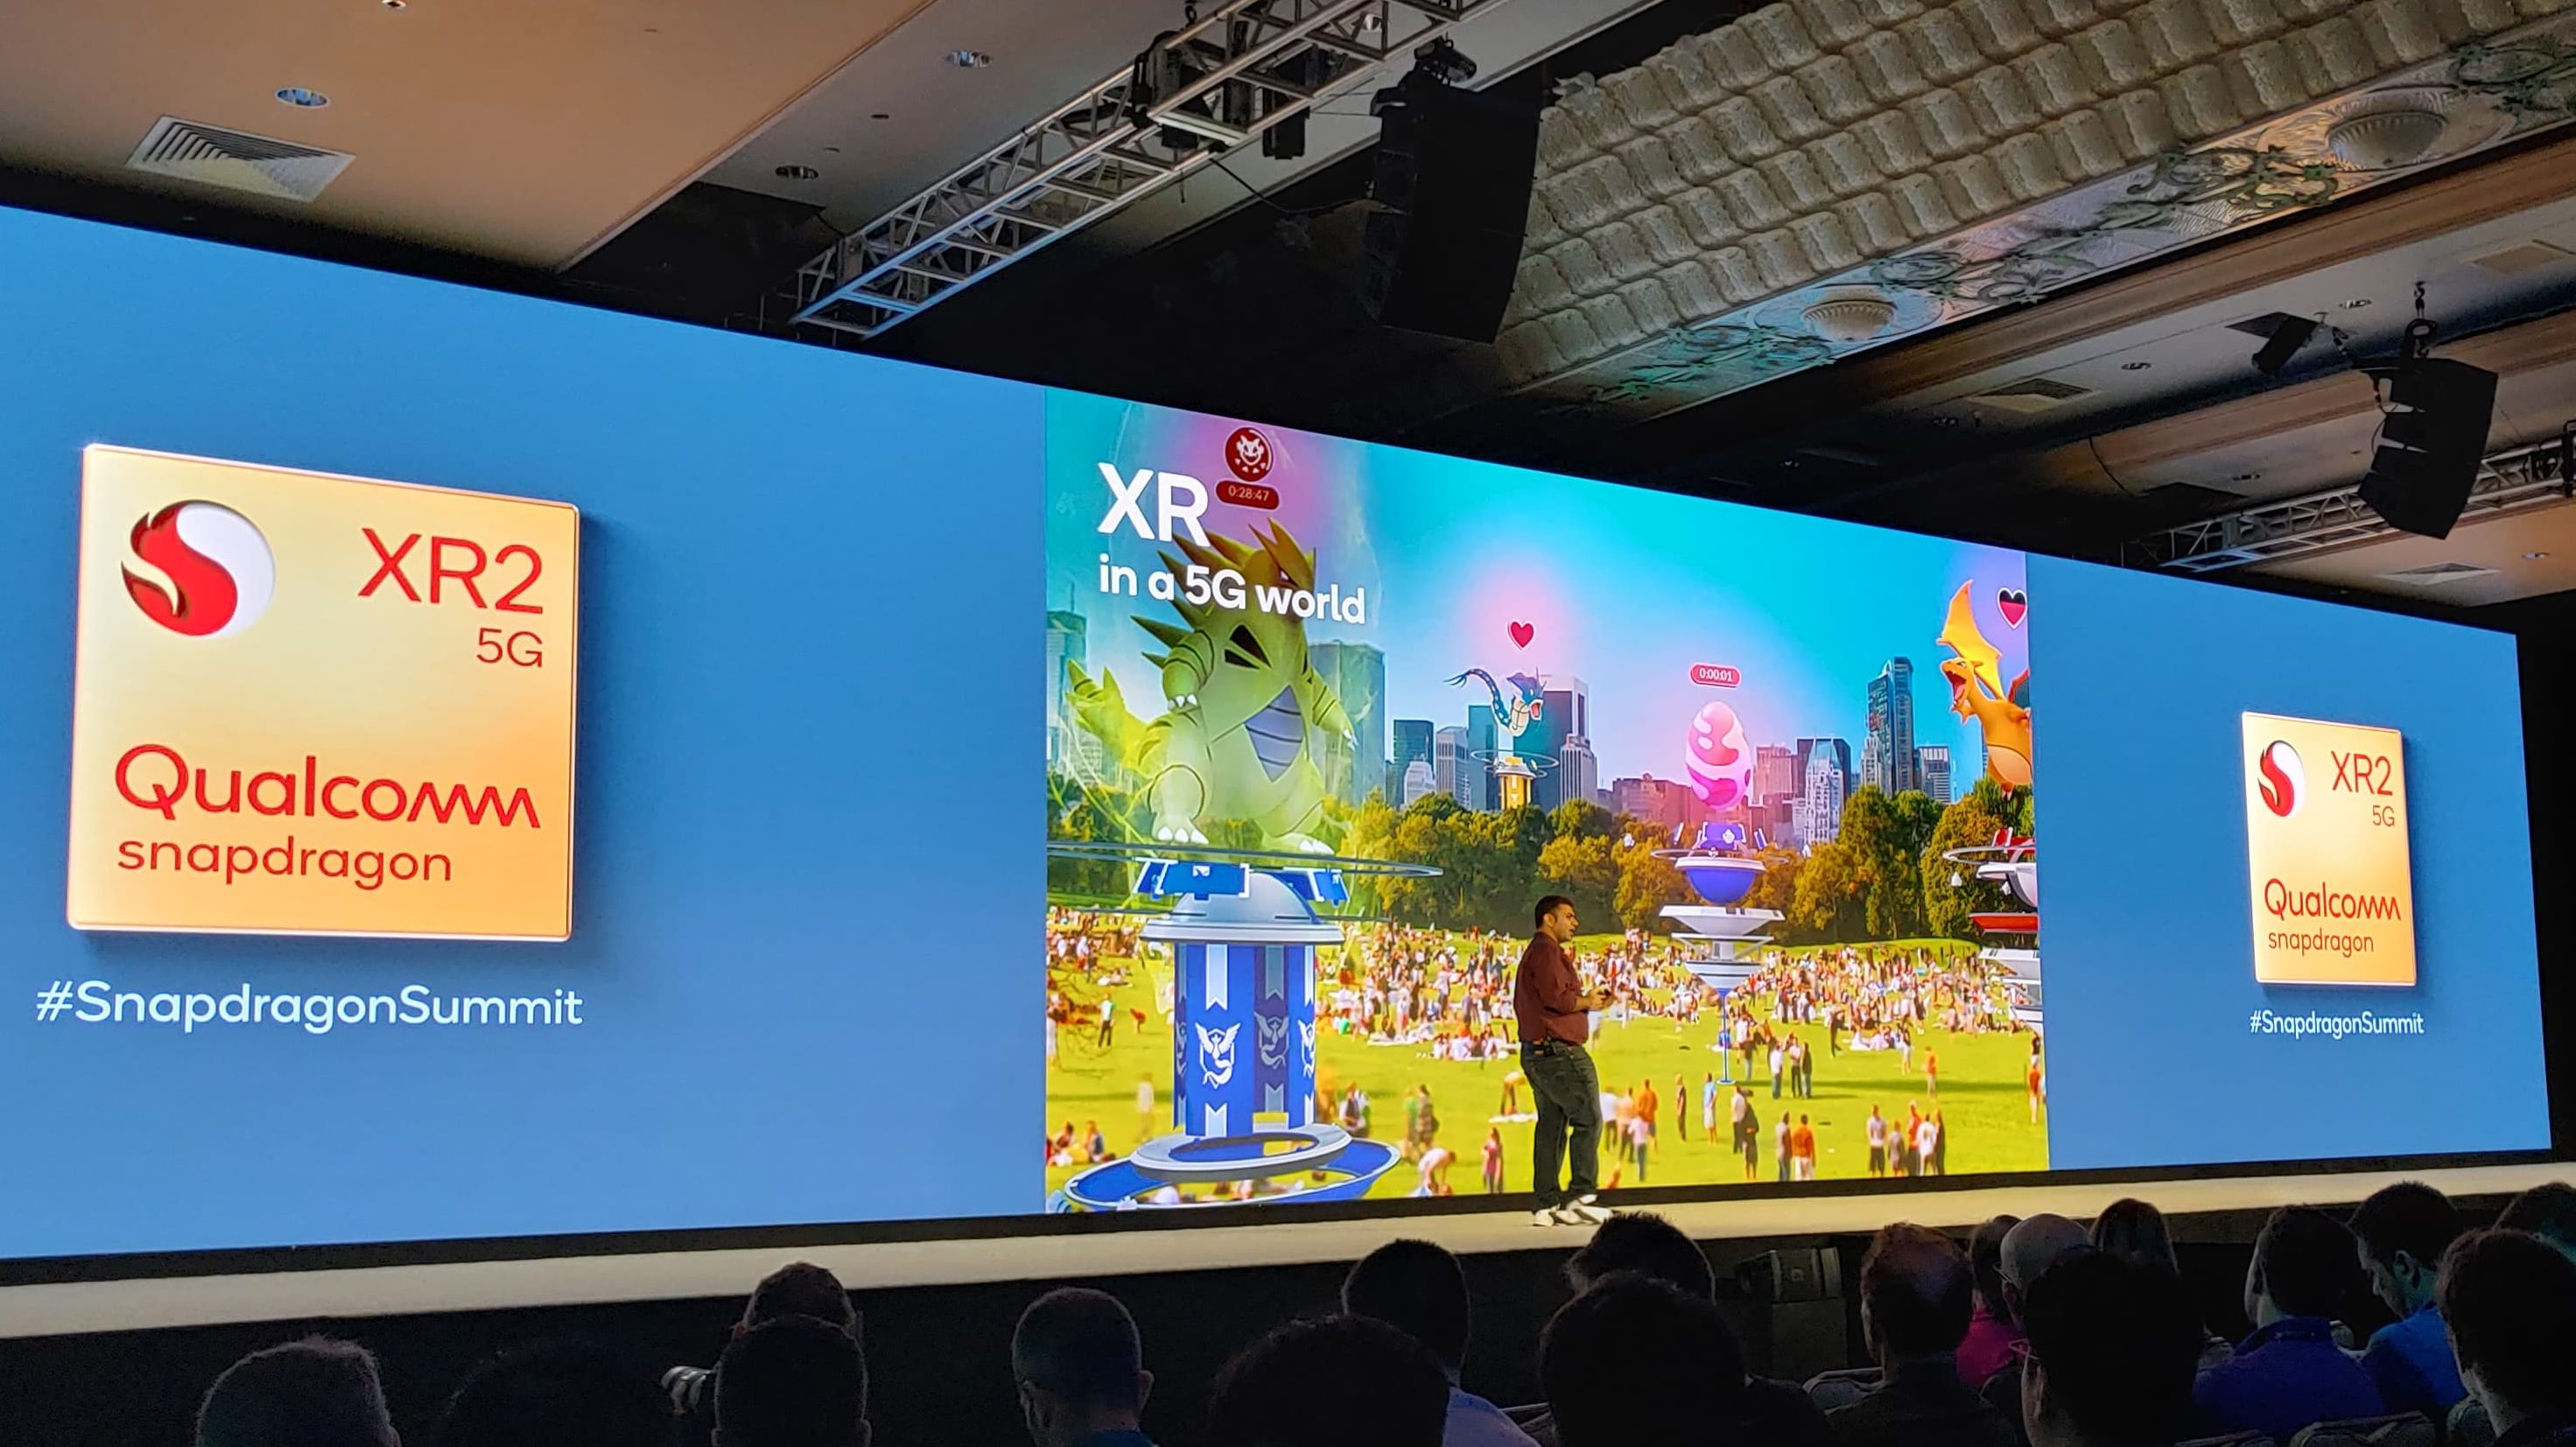 Qualcomm aposta na realidade virtual com Snapdragon XR2